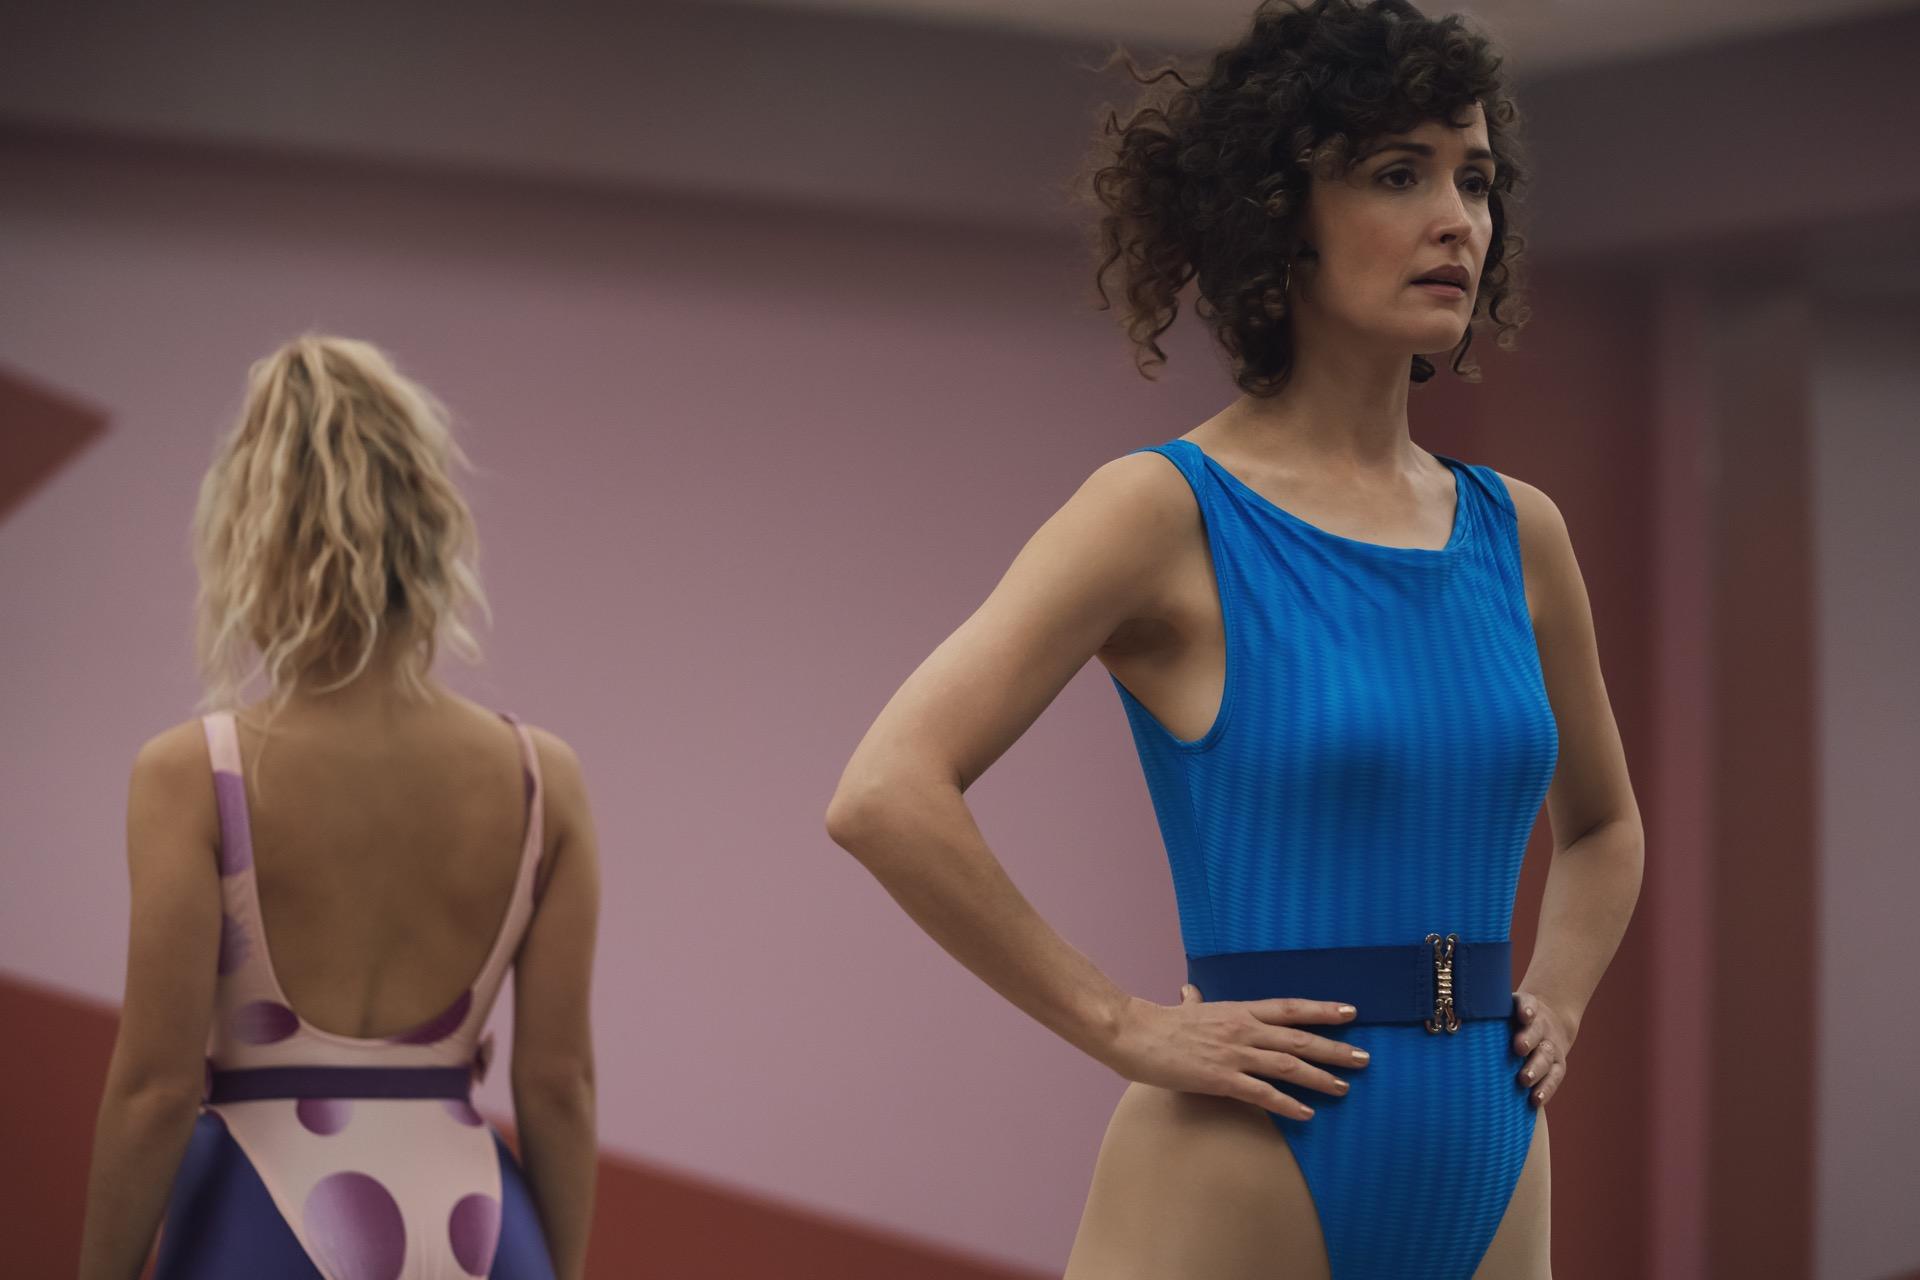 Rose Byrne as Sheila Rubin in Physical